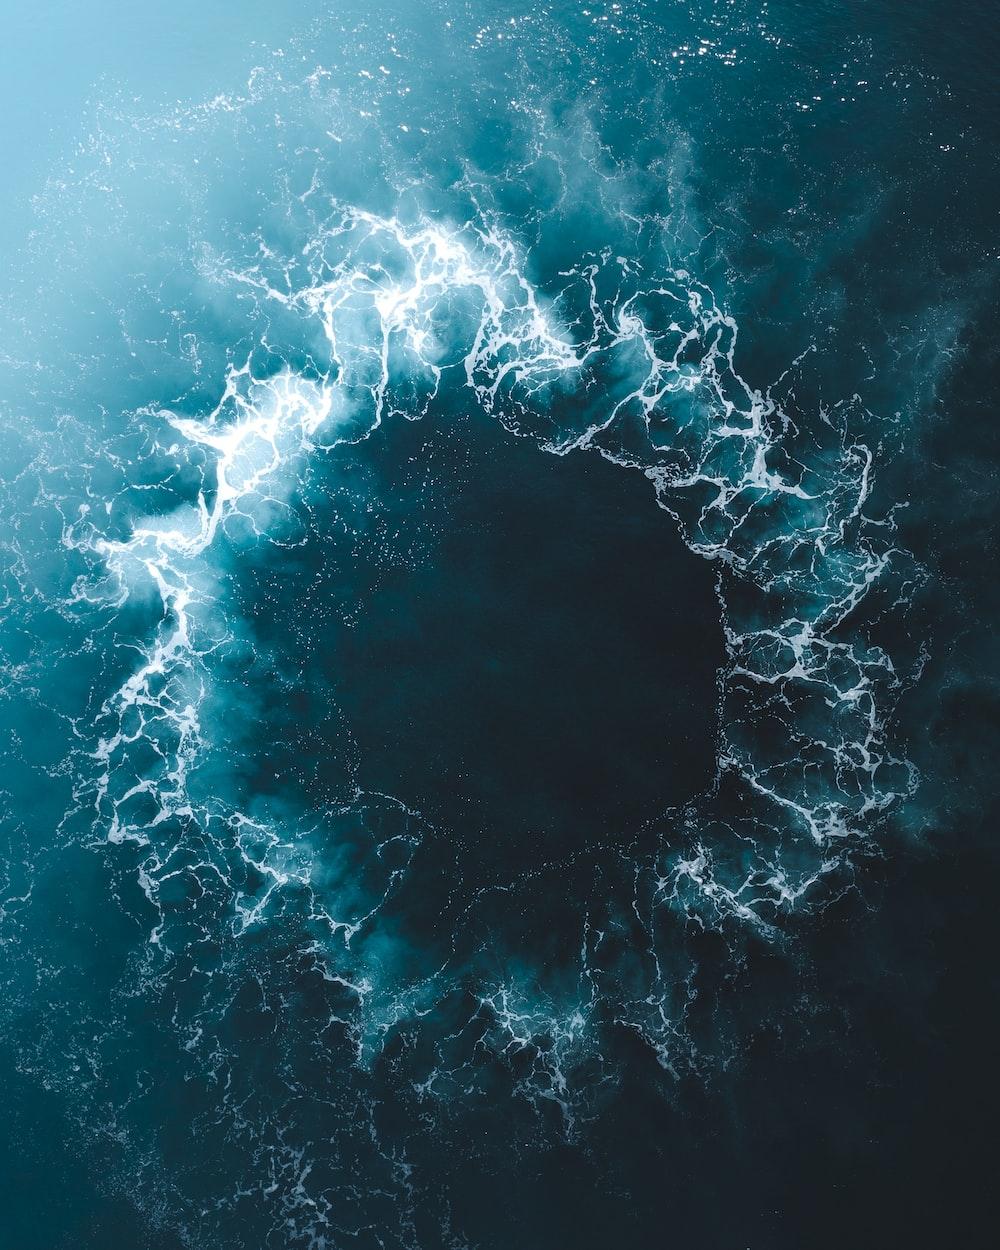 blue and white water splash